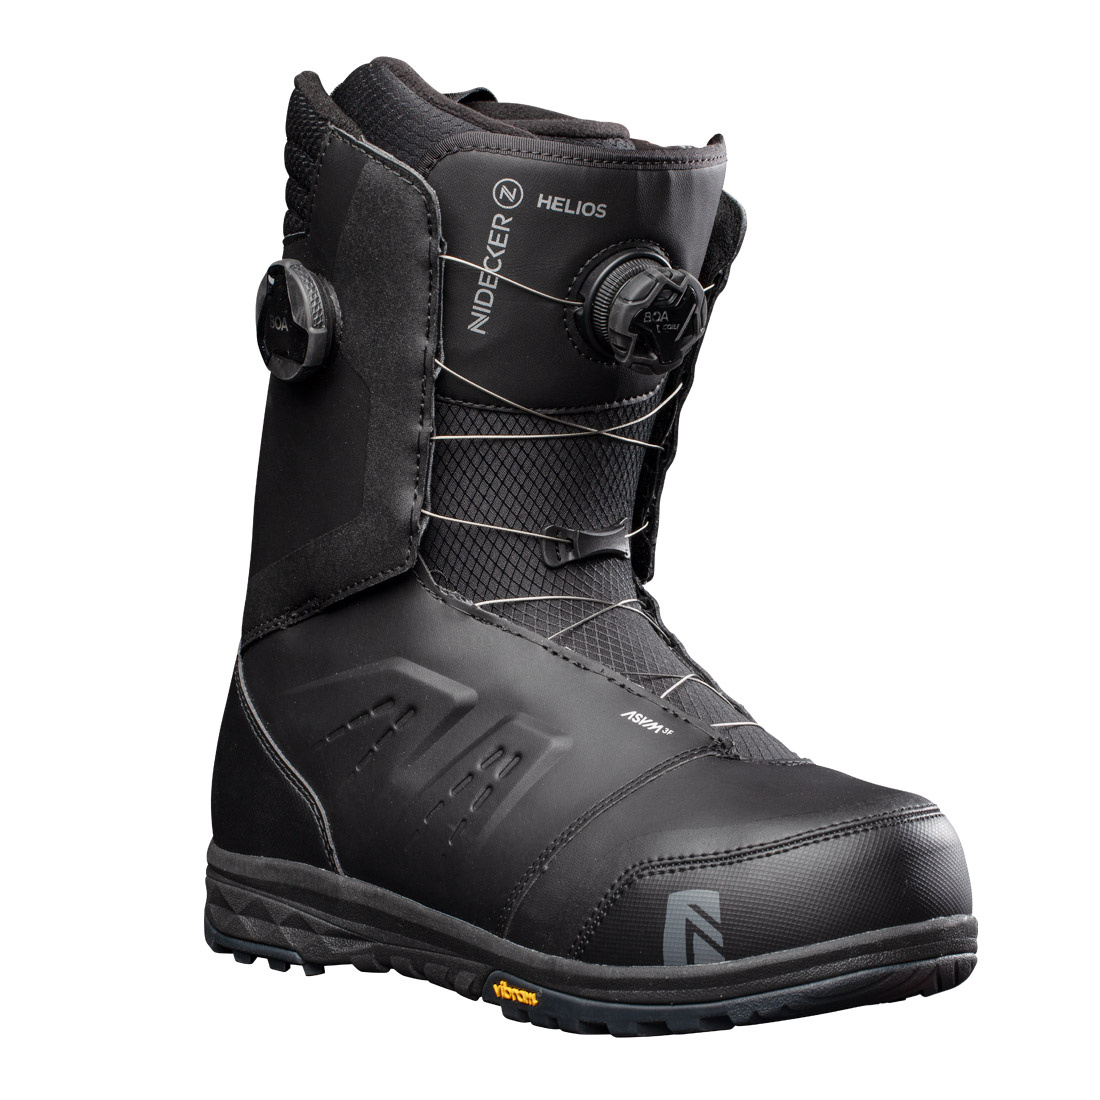 Boots snowboard Barbati Nidecker Helios Focus Boa Negru 20/21 imagine